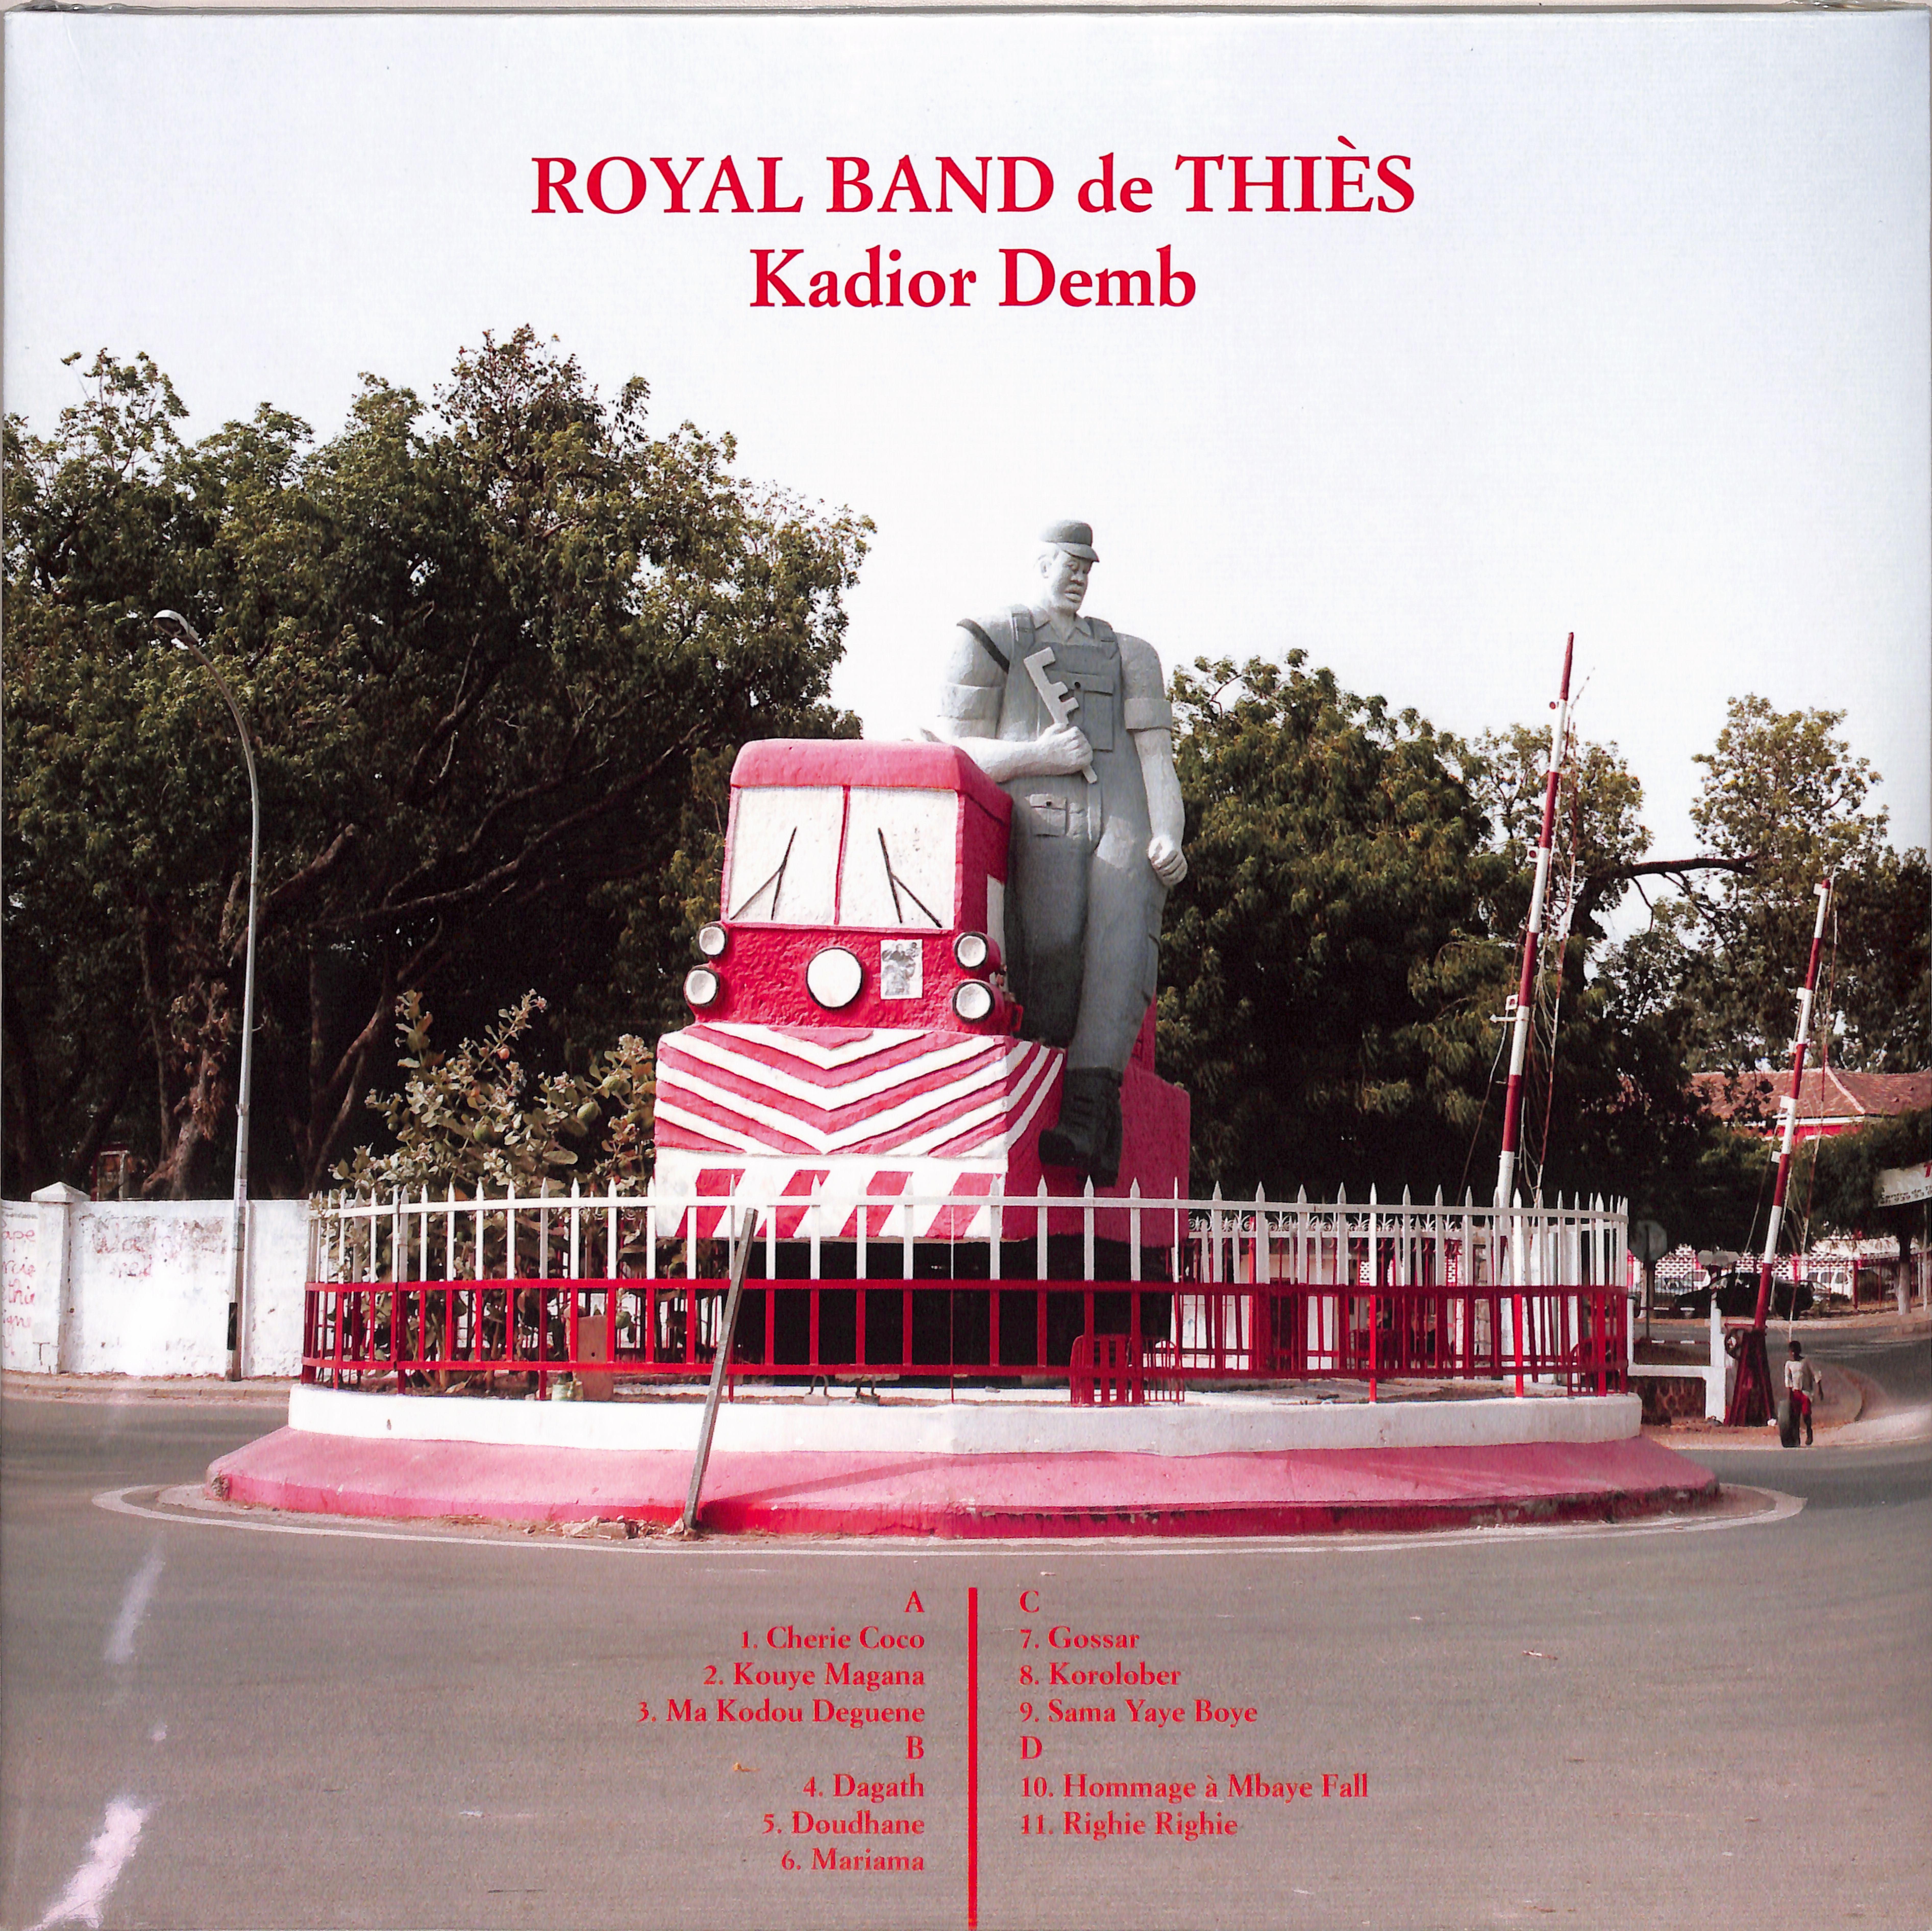 Royal Band De Thies - KADIOR DEMB